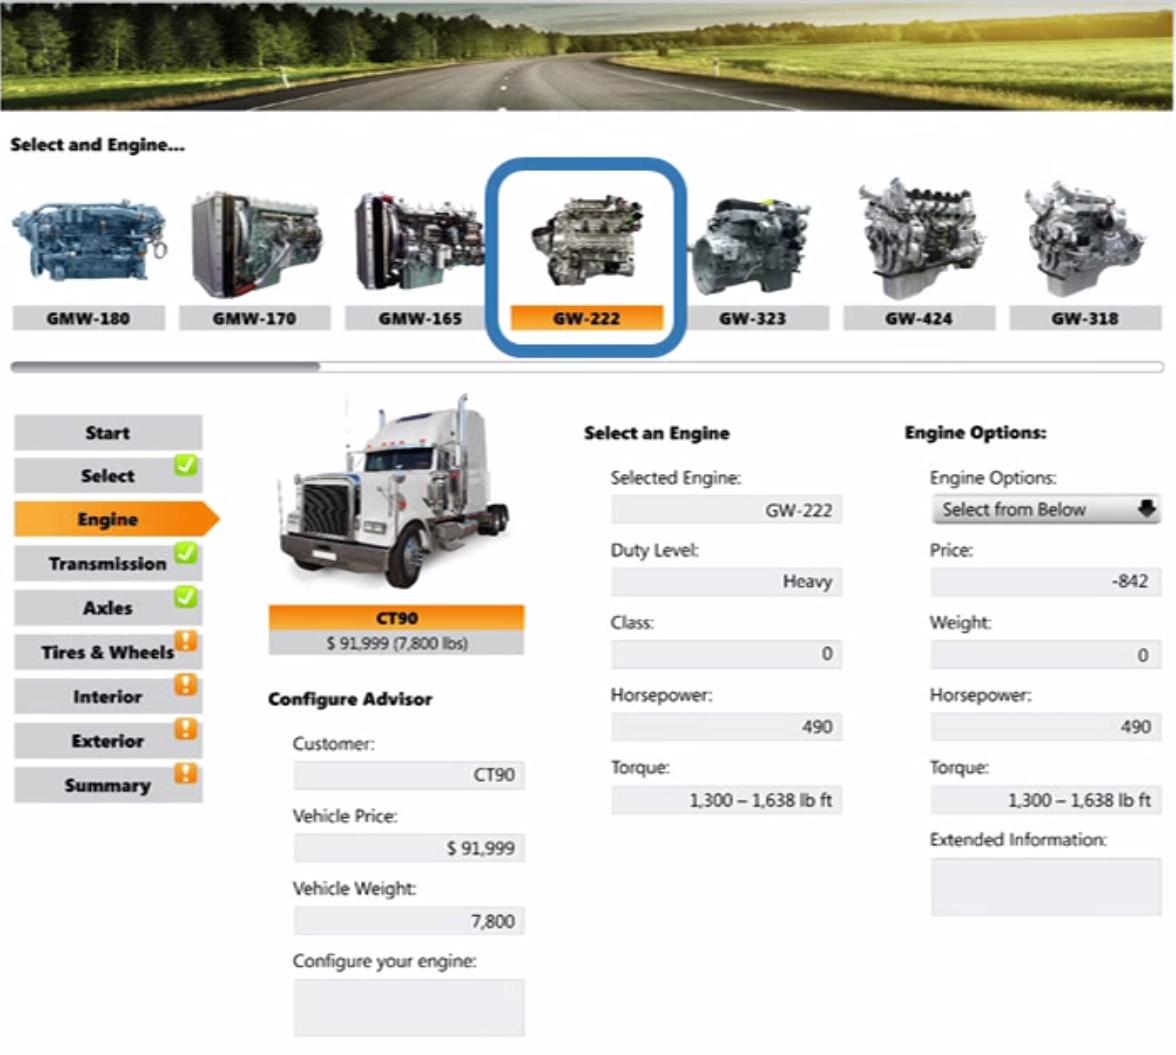 TruckDemo-Engines